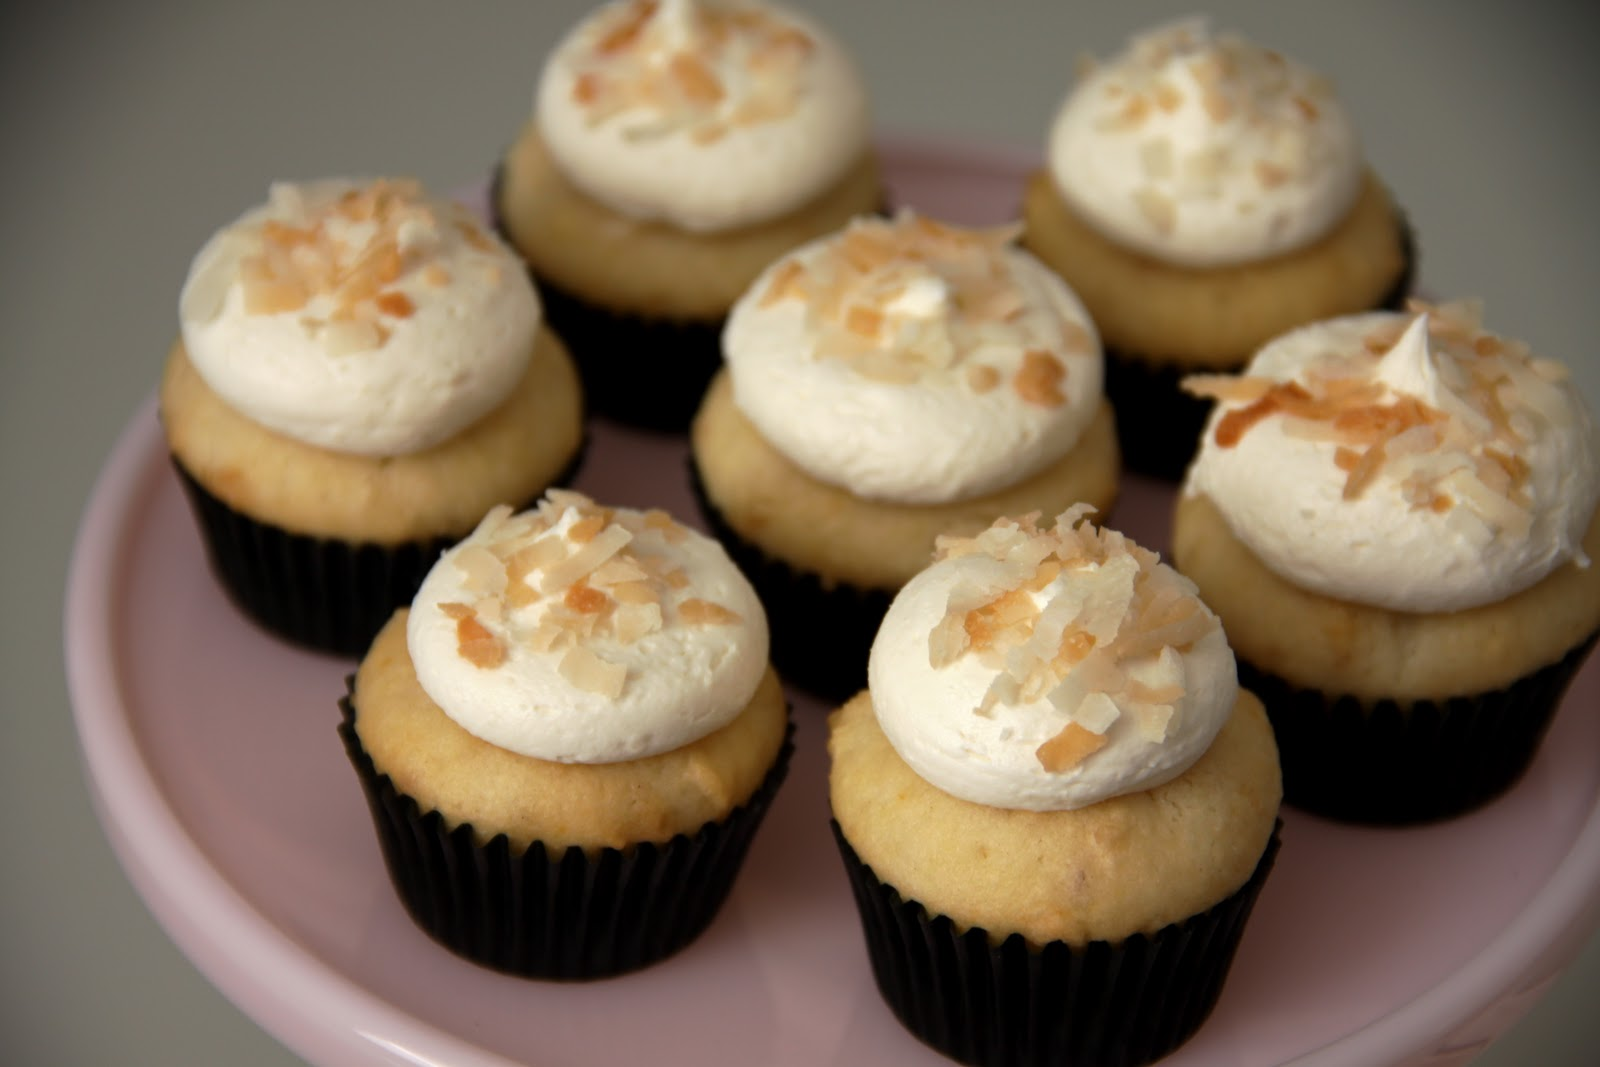 Honey Bee Sweeterie: White Chocolate Macadamia Nut Cupcakes